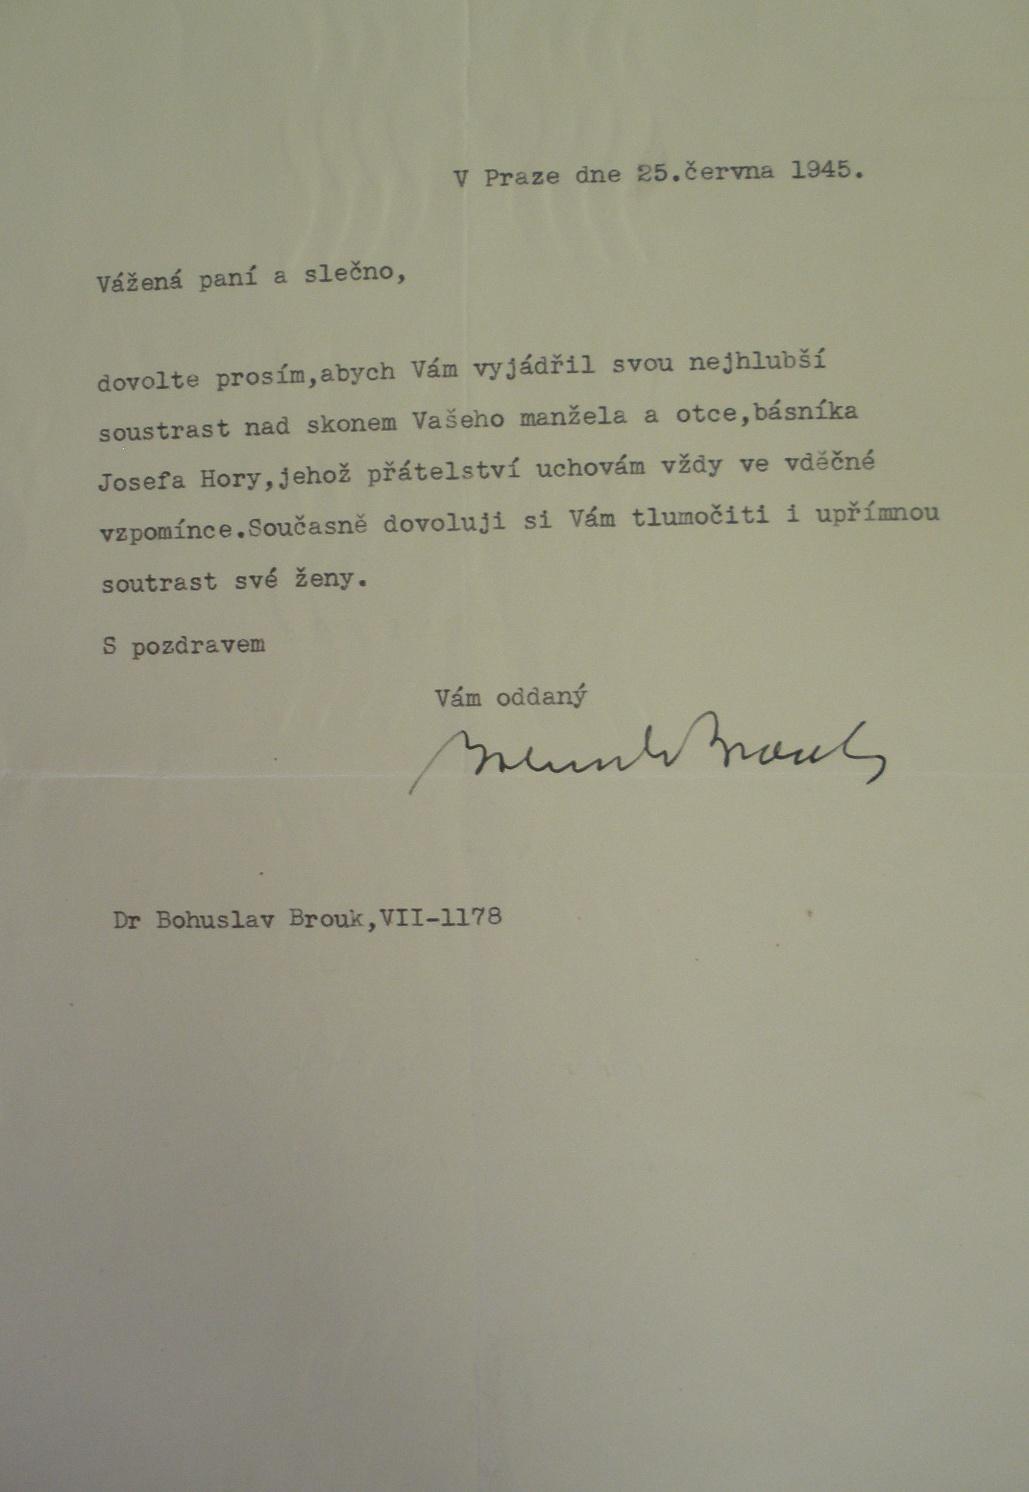 Kondolence pozůstalým po Josefovi Horovi, 25. června 1945